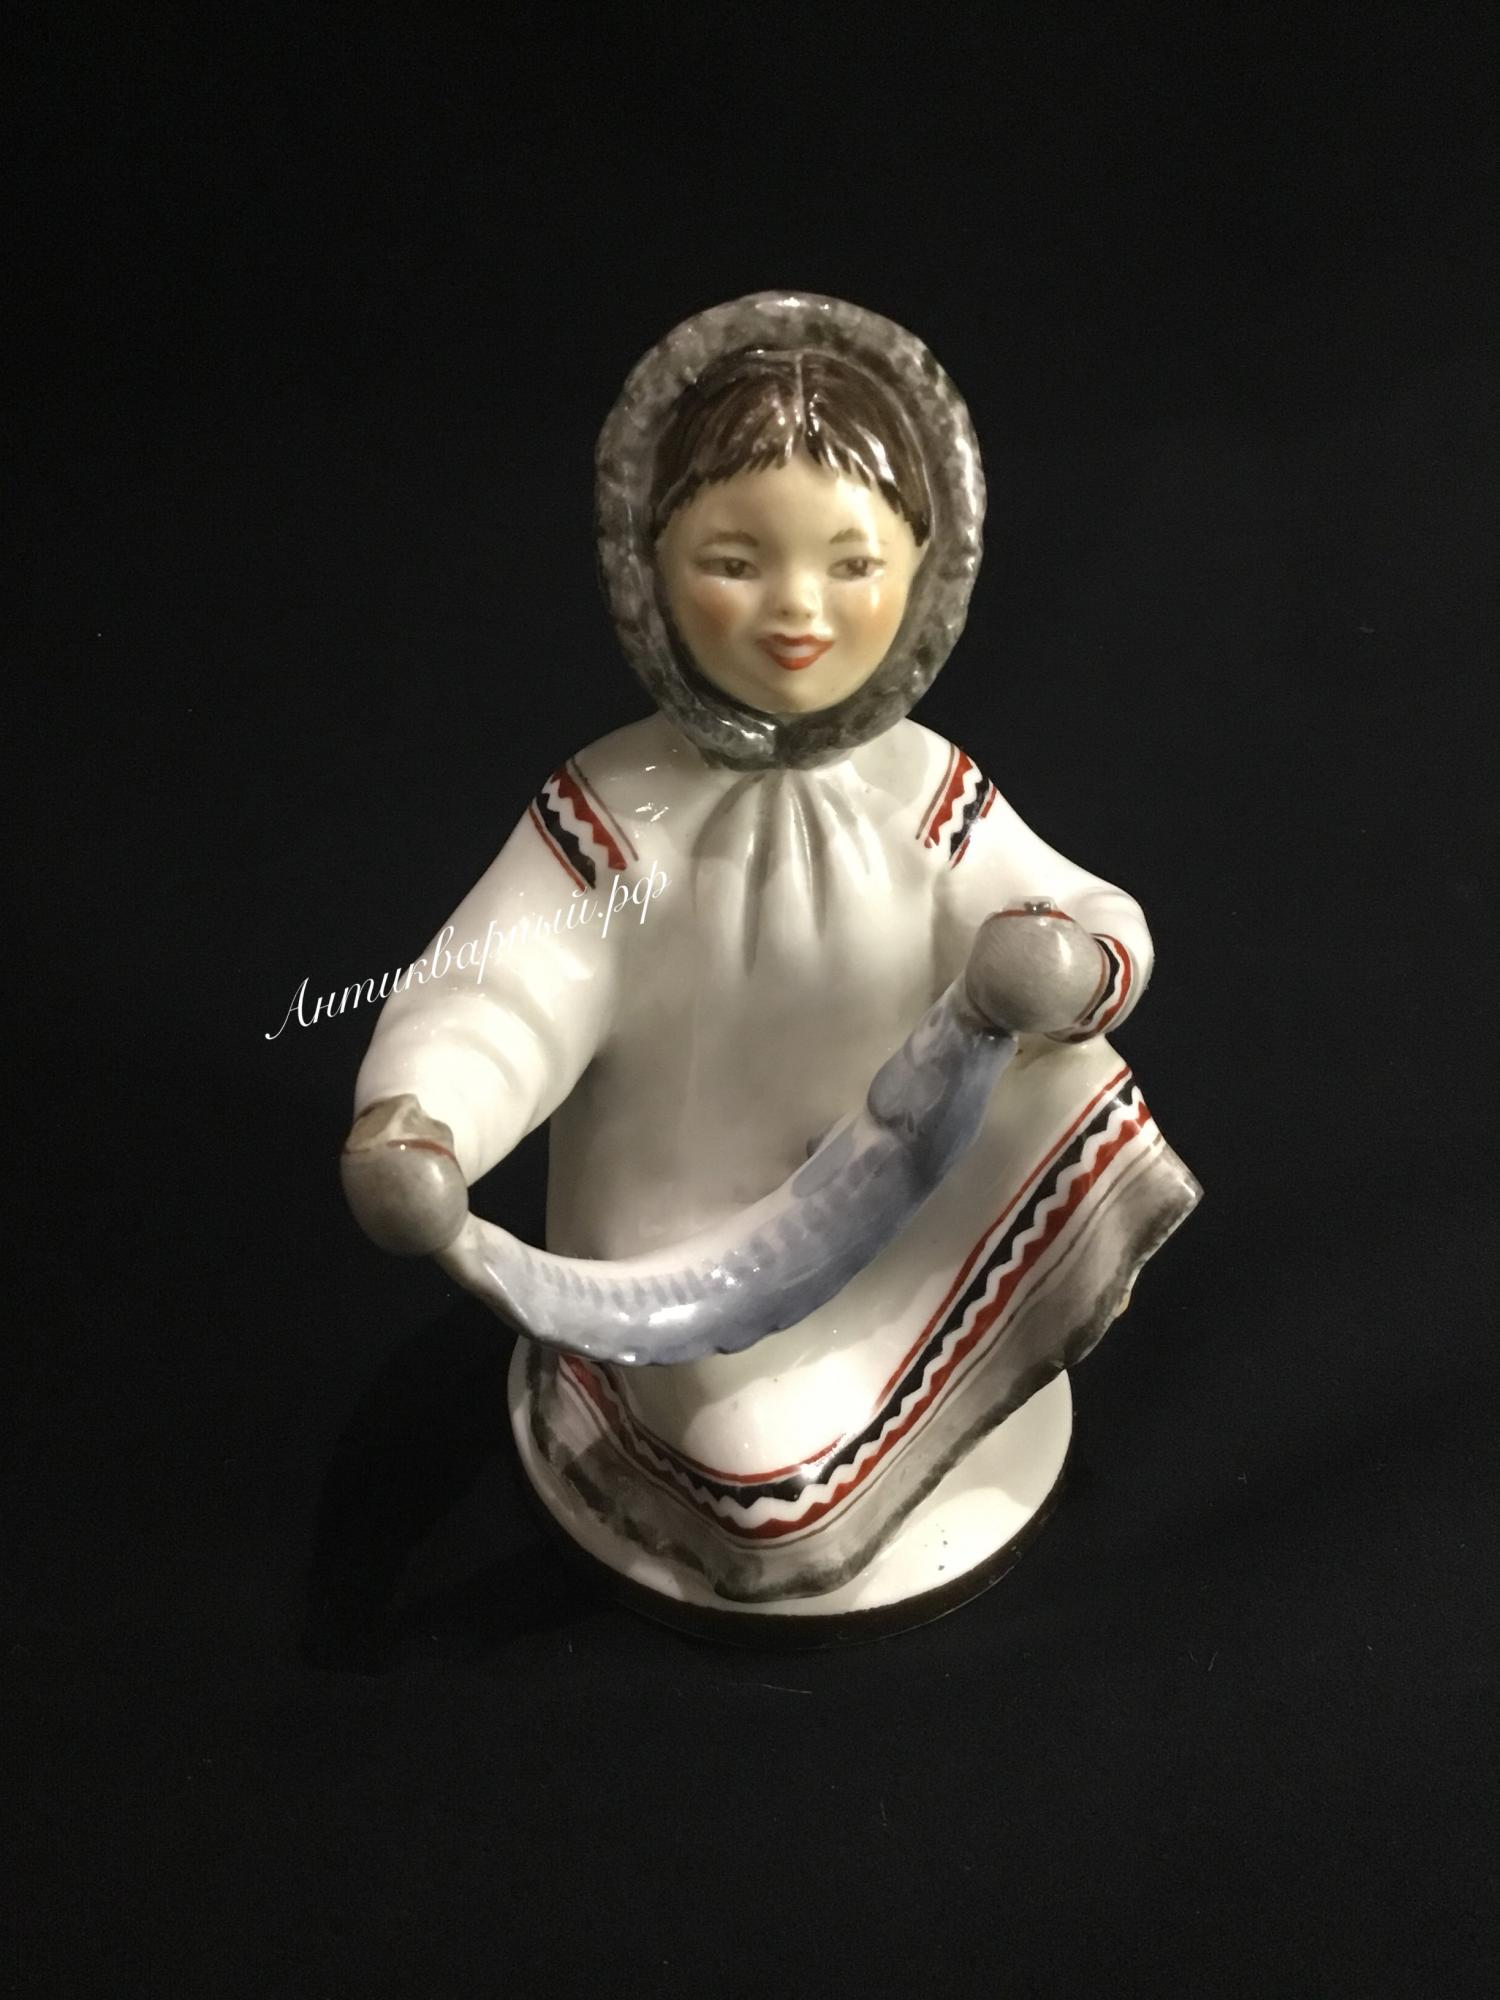 Фарфоровая статуэтка чукча лфз